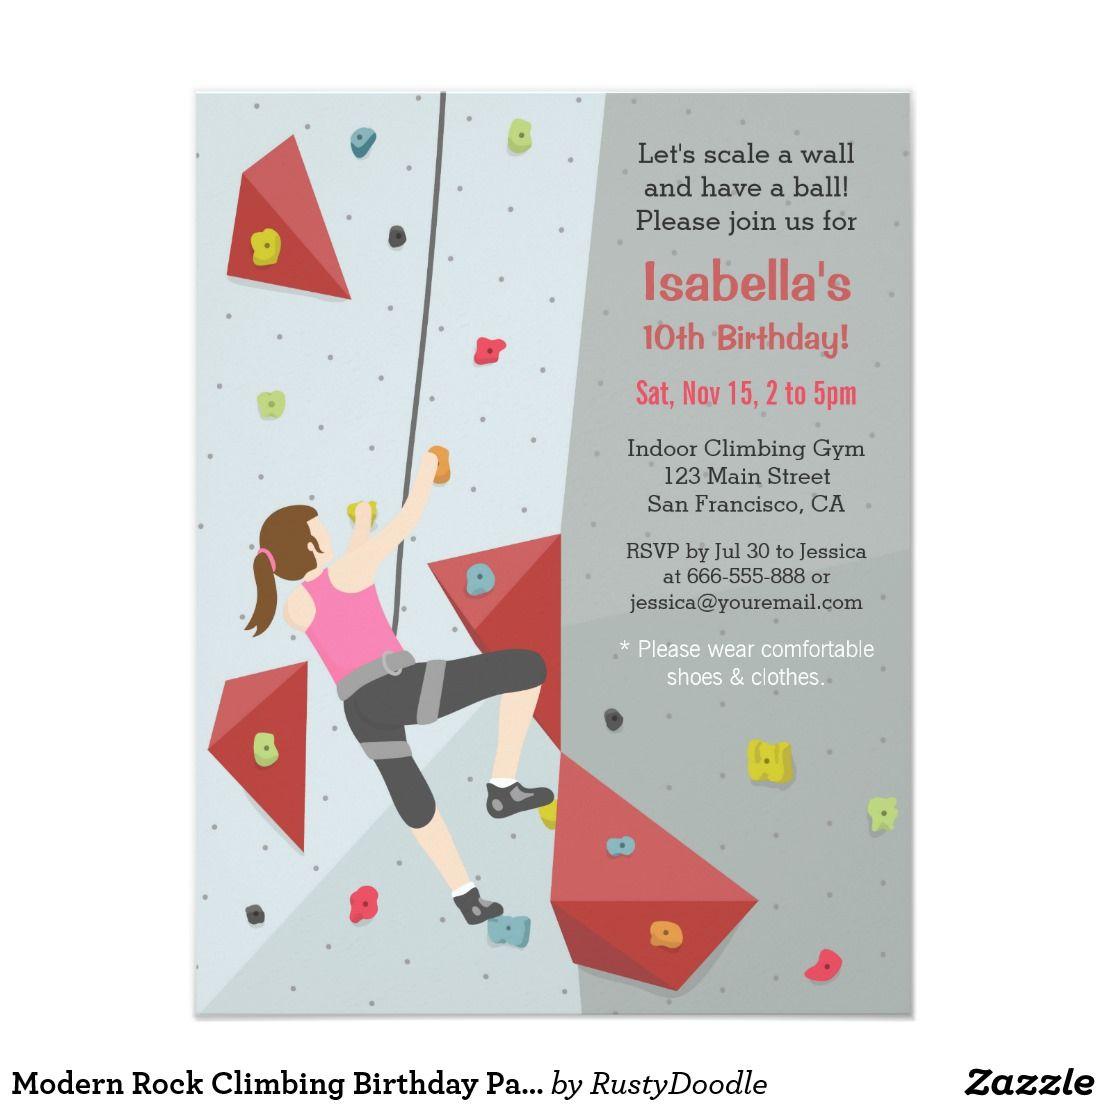 Modern Rock Climbing Birthday Party Invitations | Rock climbing and ...